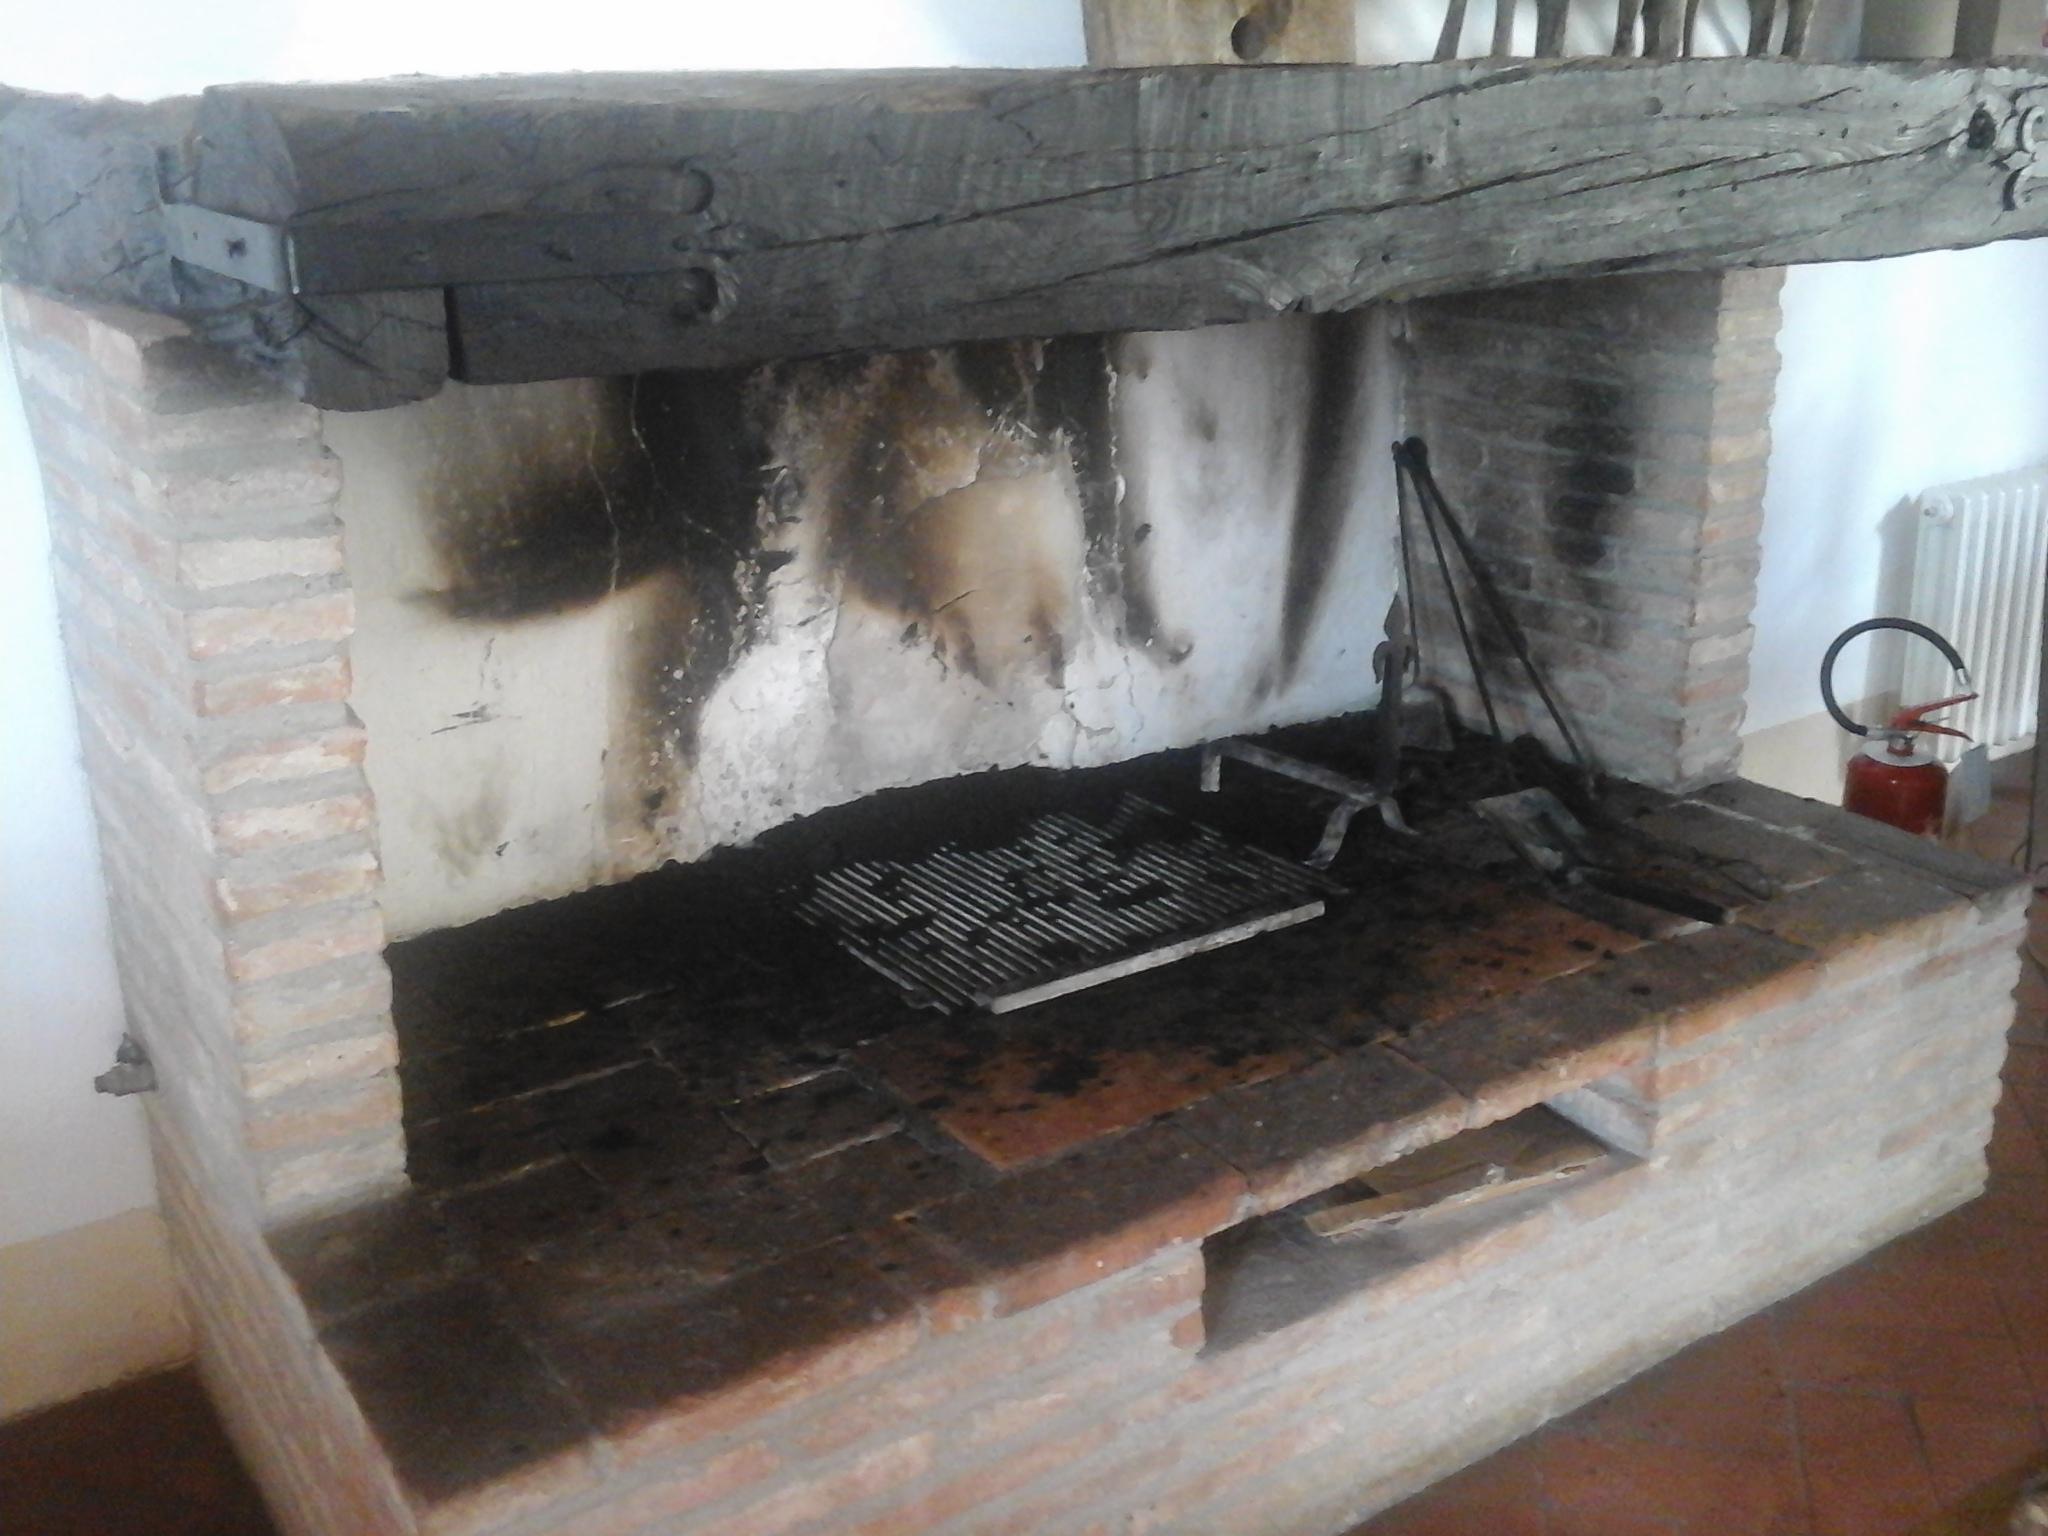 spazzacamino siena | pulizia canna fumaria